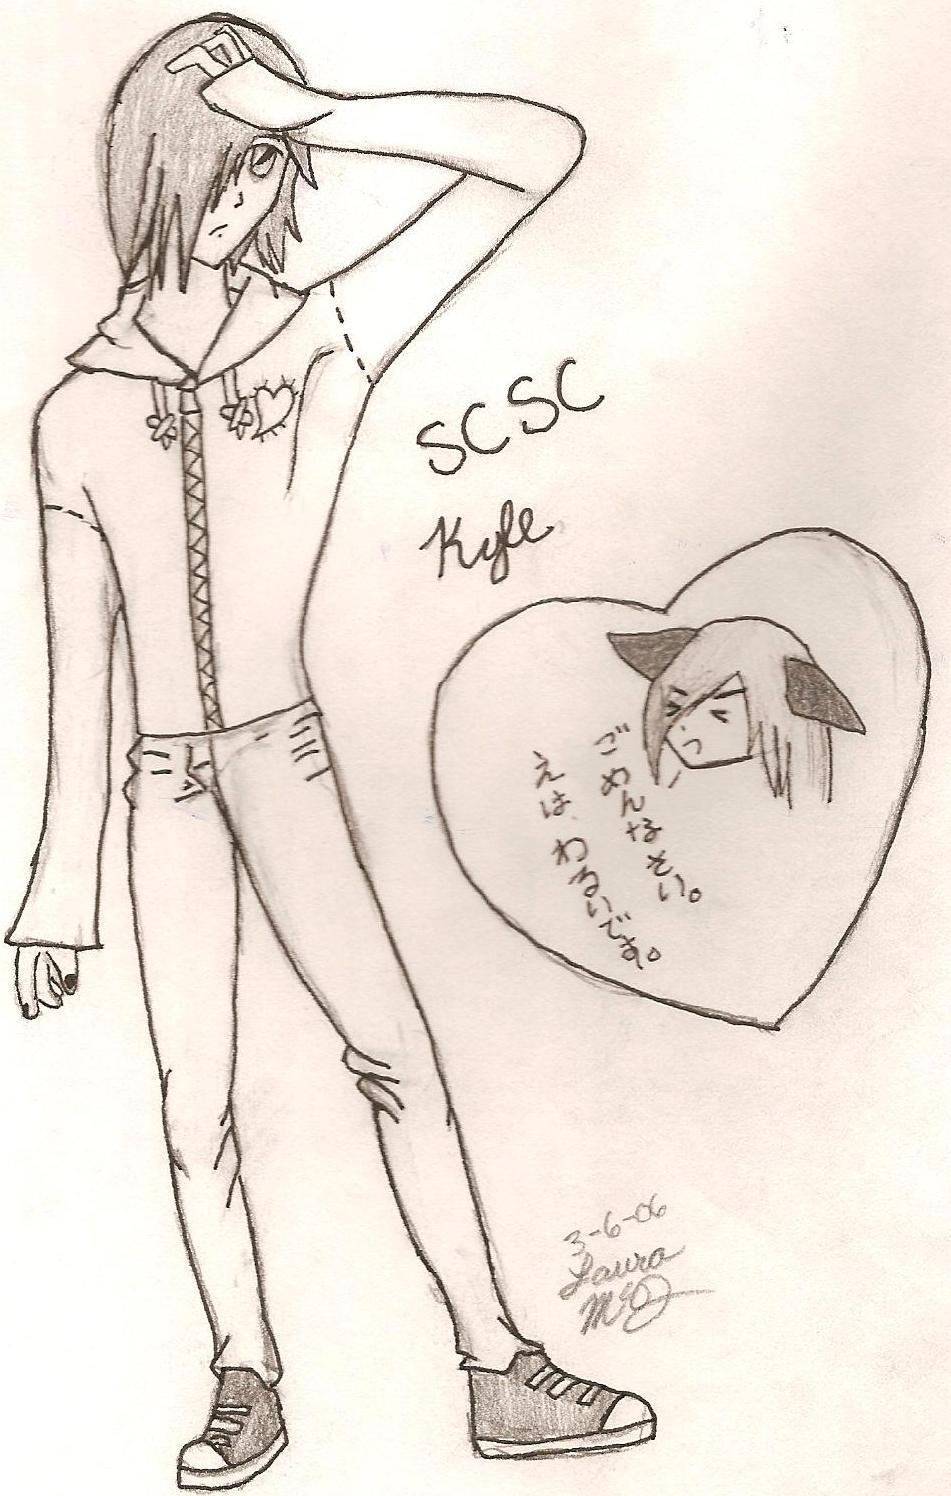 SCSC-Kyle by Derufin